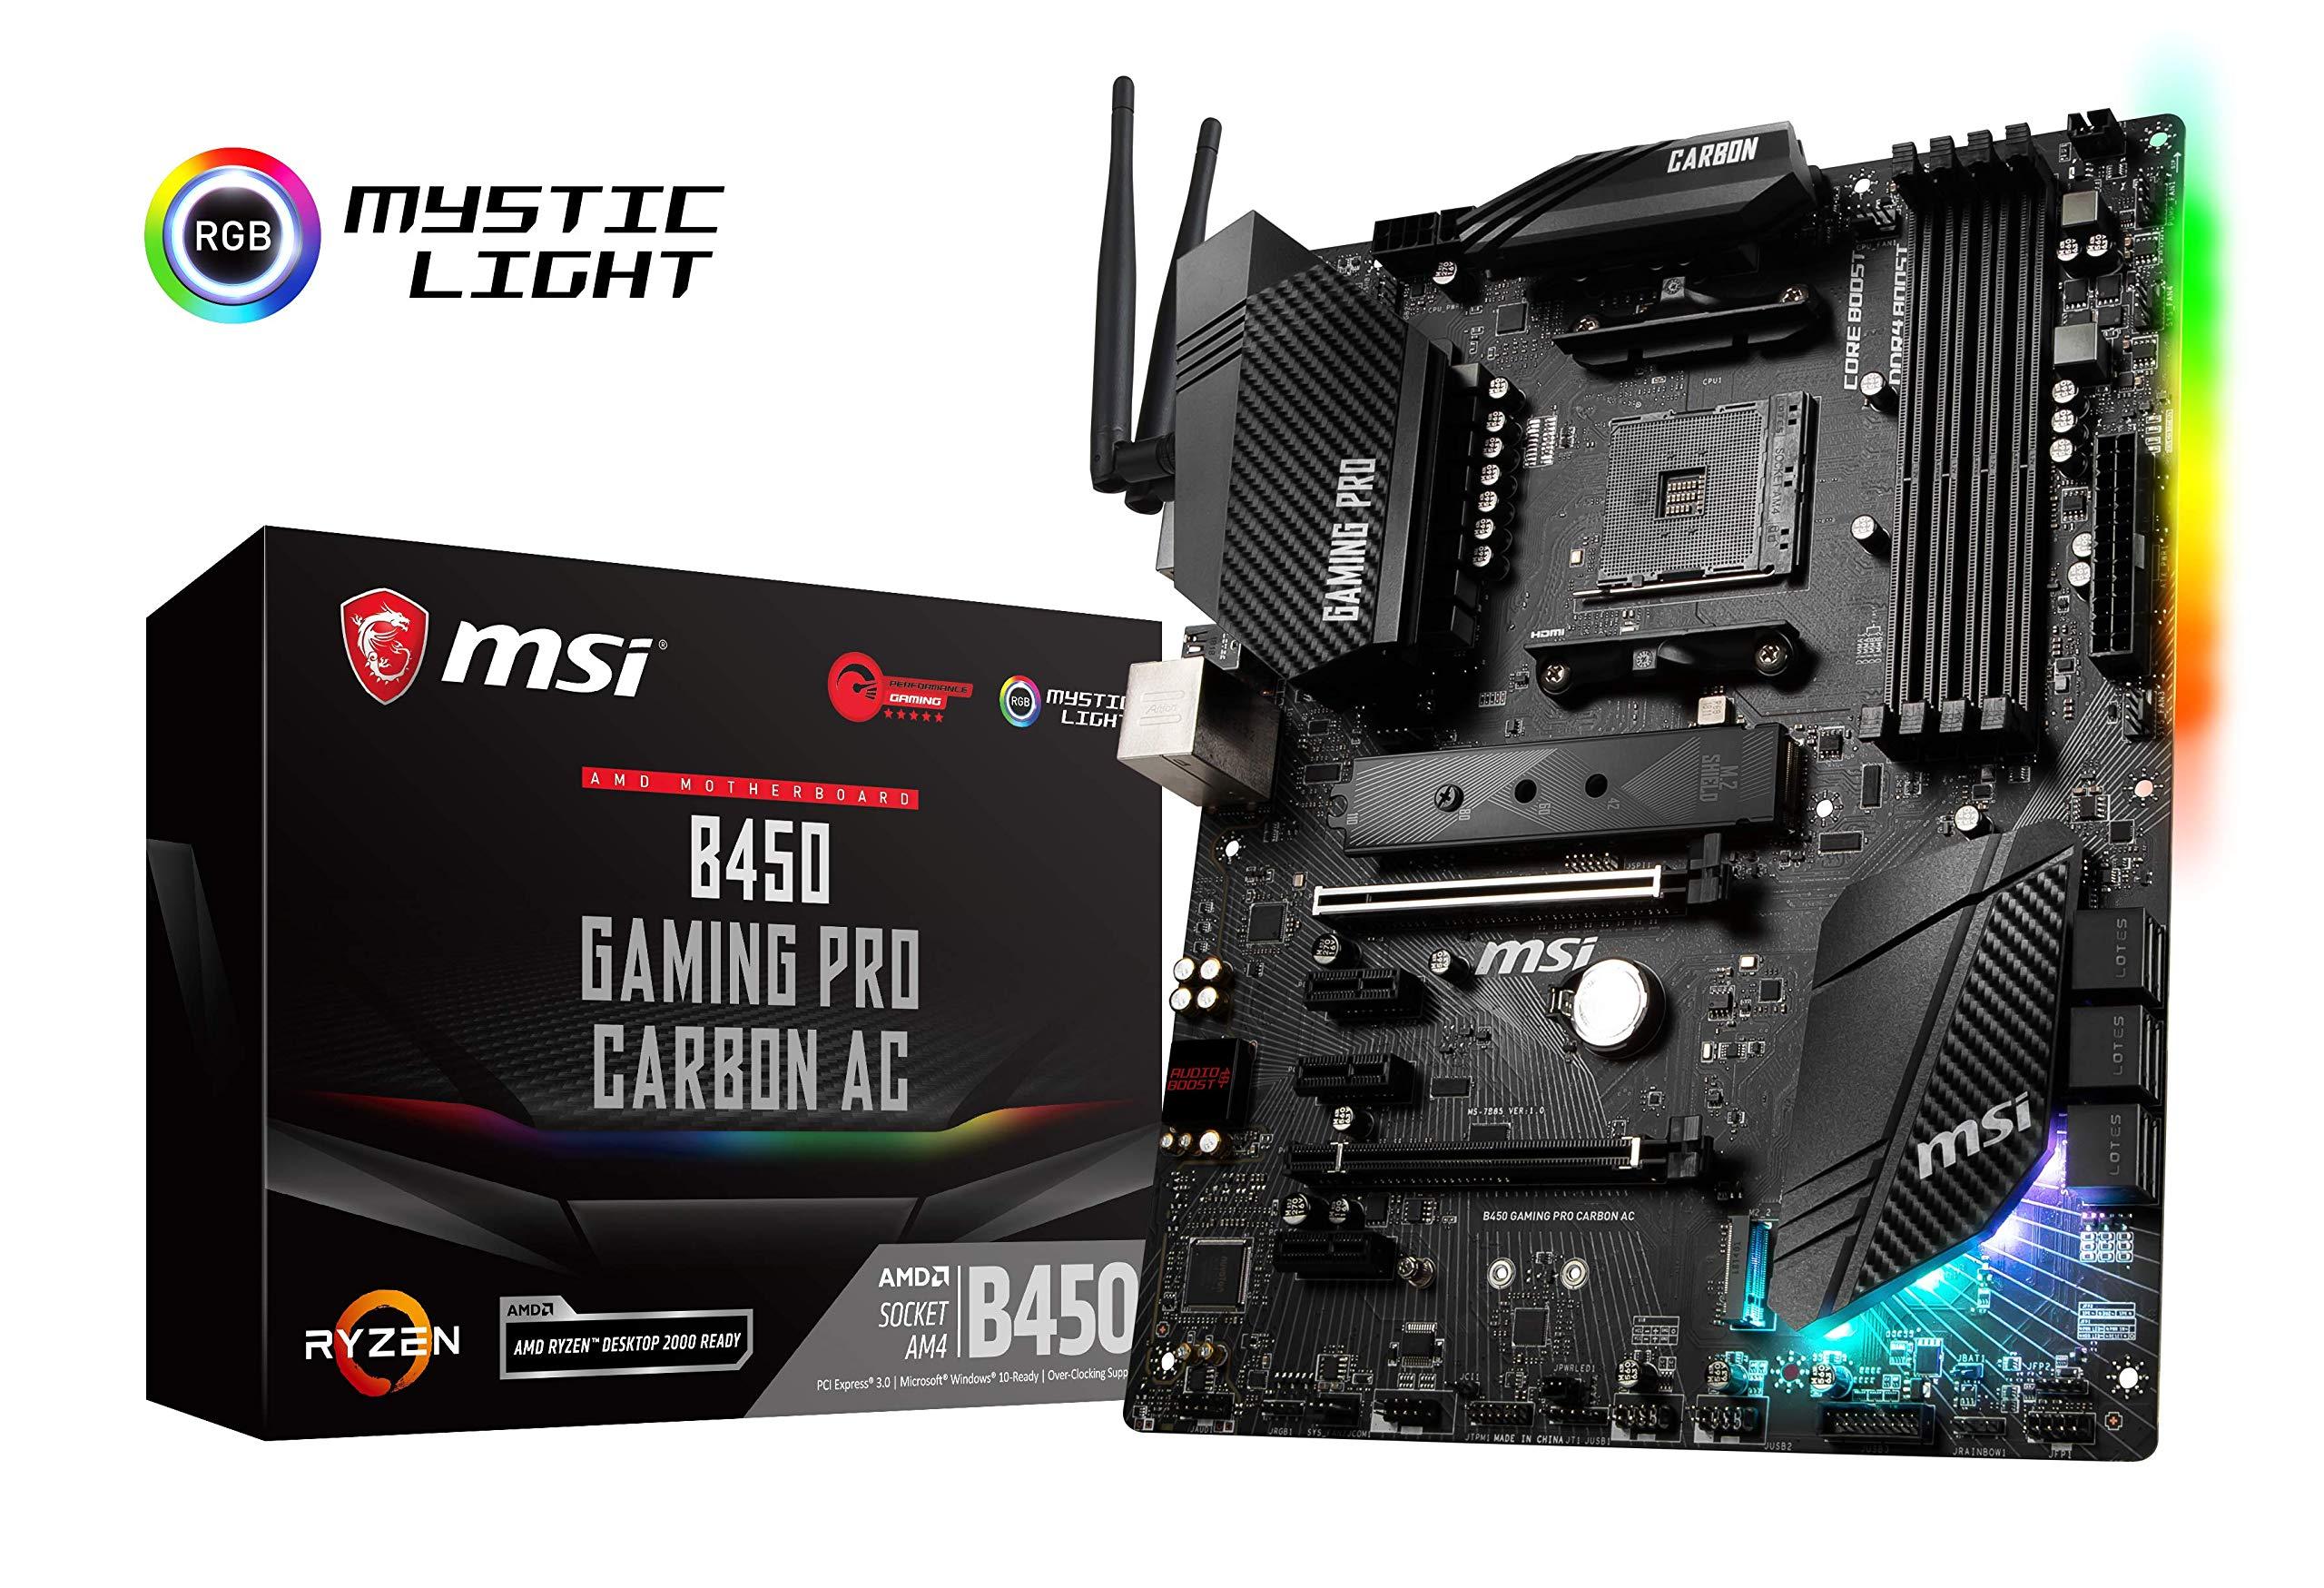 Msi B450 Gaming Pro Carbon Ac Motherboar Buy Online In Bangladesh At Desertcart